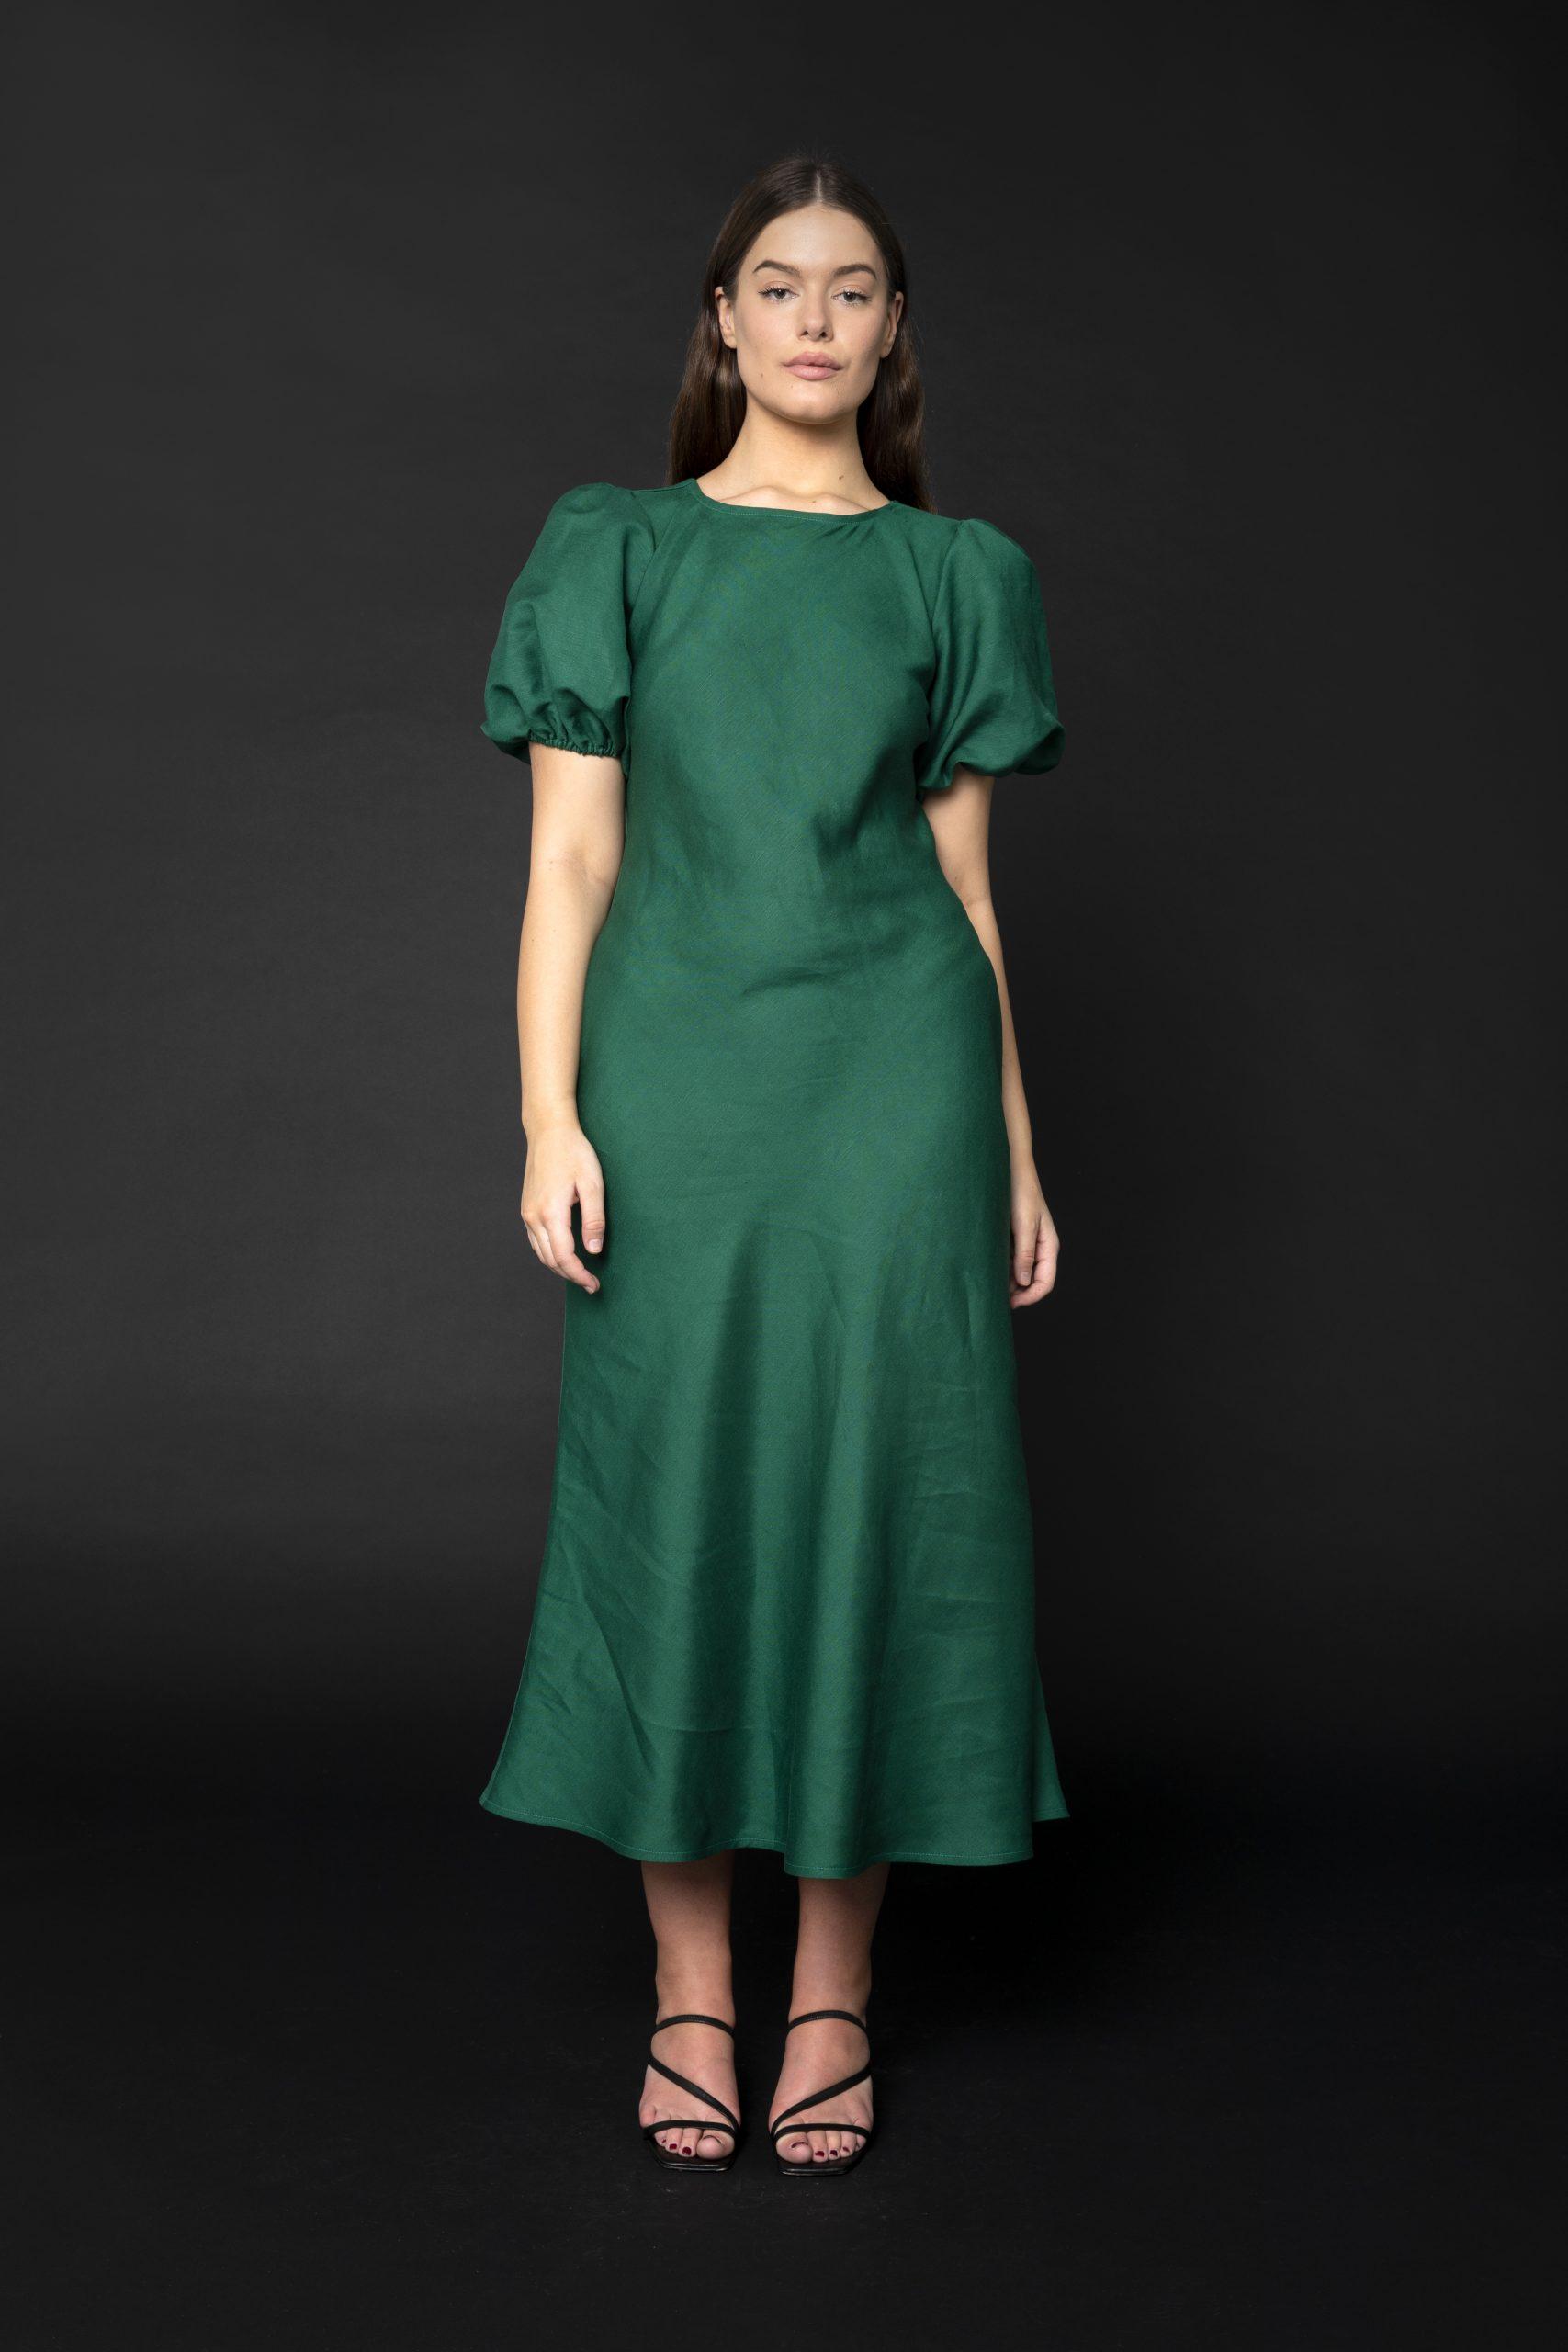 RUBY KENDALL LINEN DRESS GREEN - ELLA